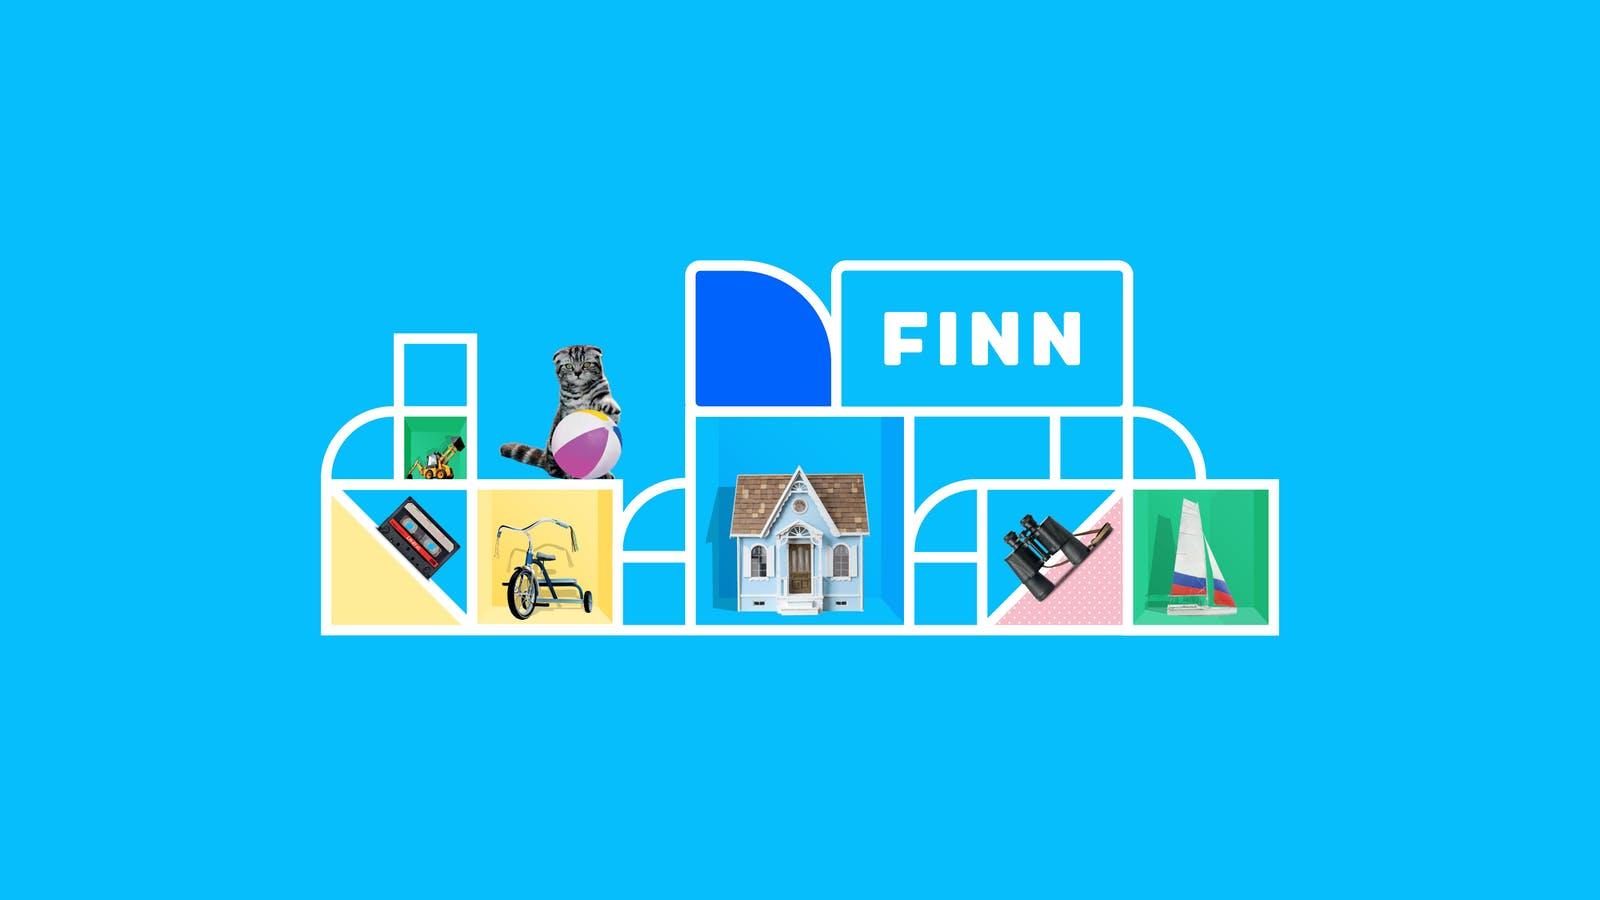 Meet FINN.no - Norways biggest online marketplace